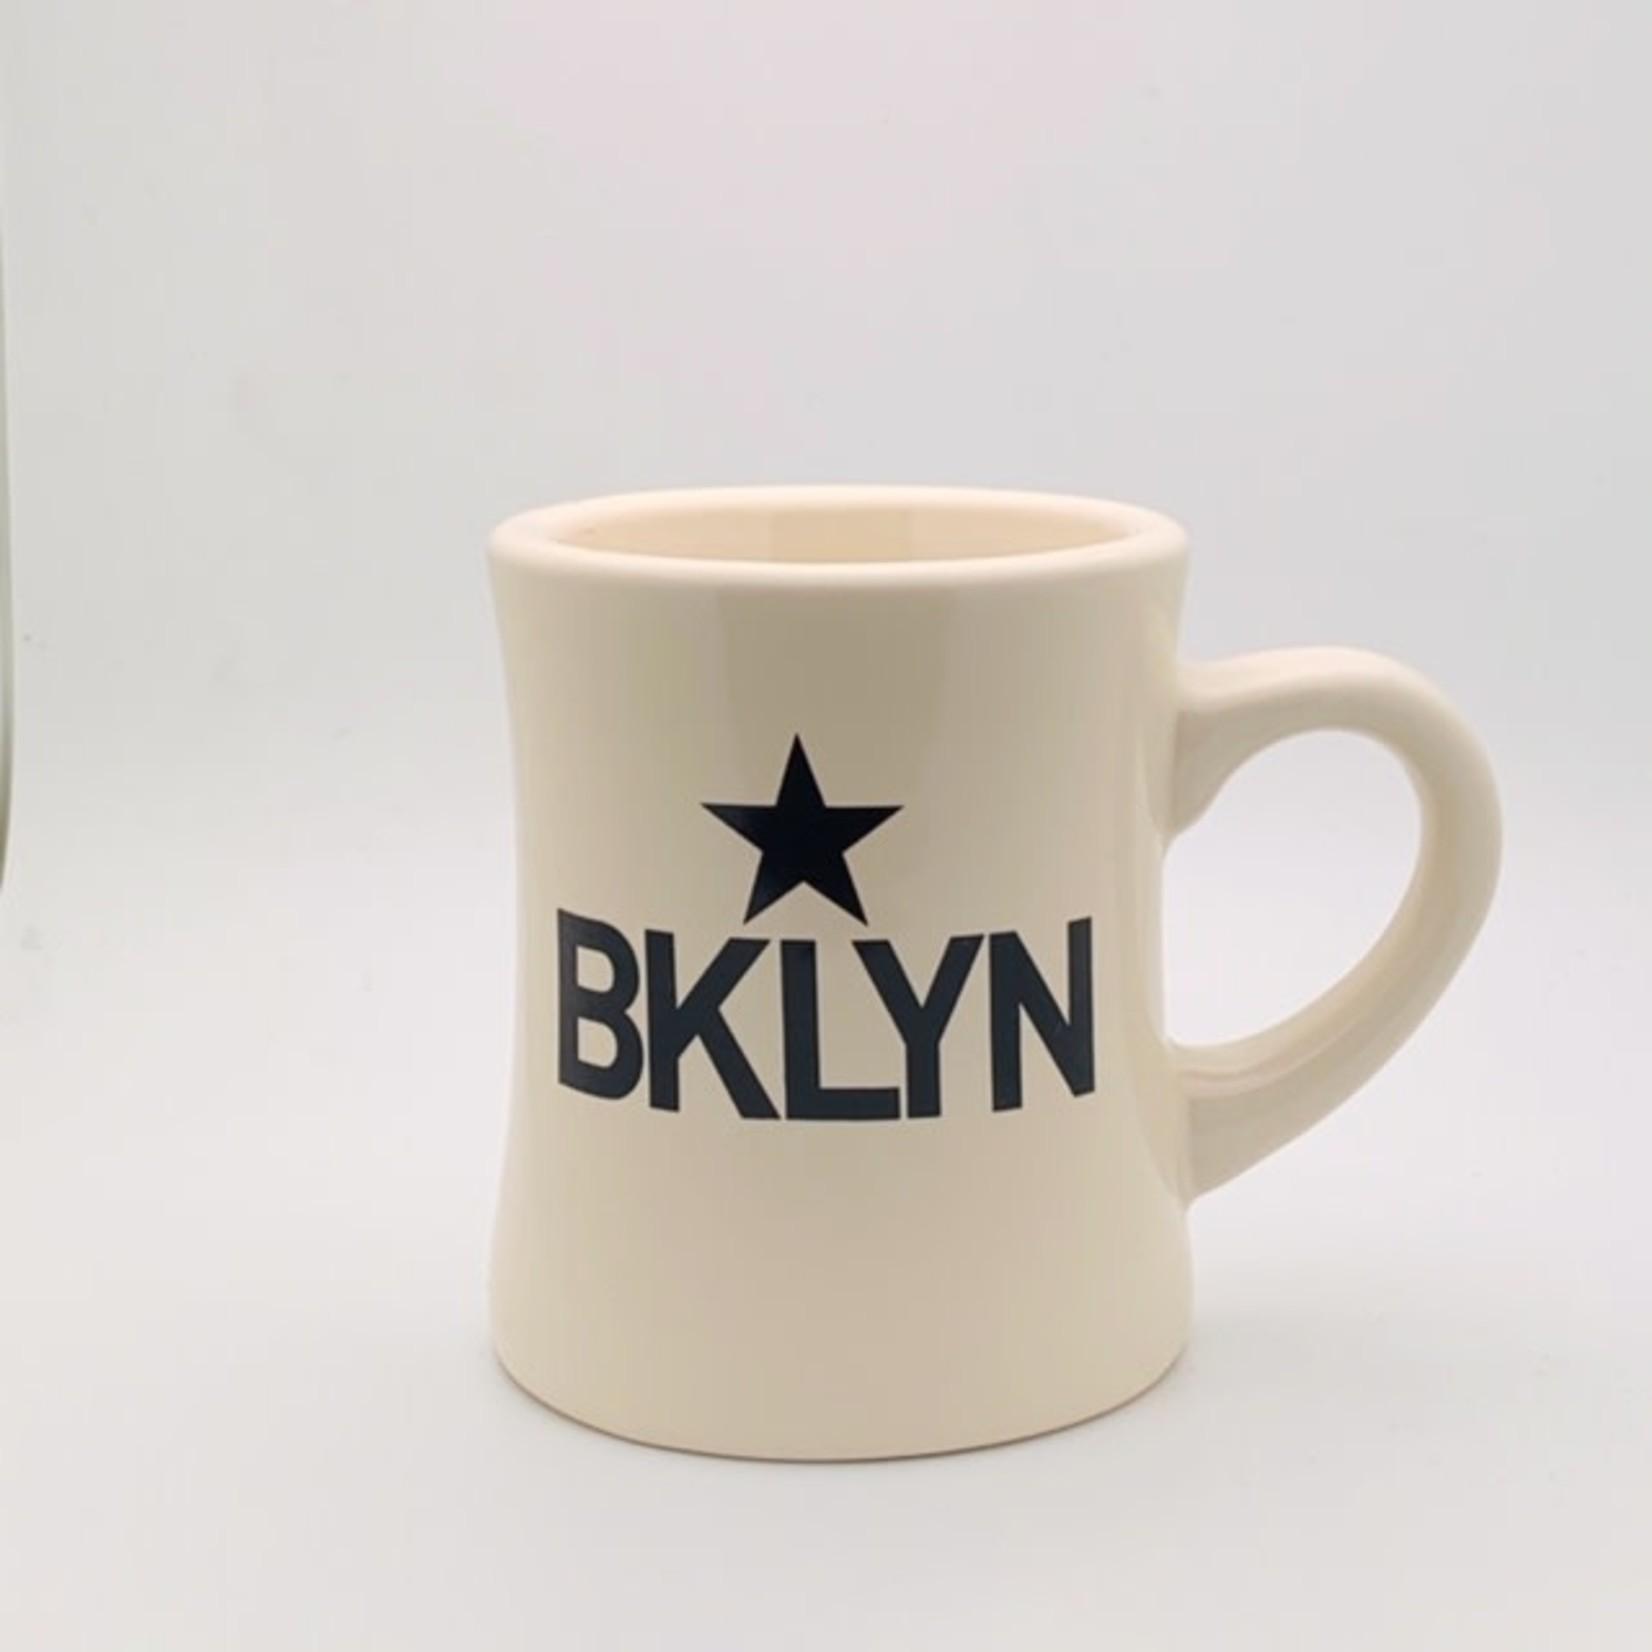 BKLYN Mug Cream